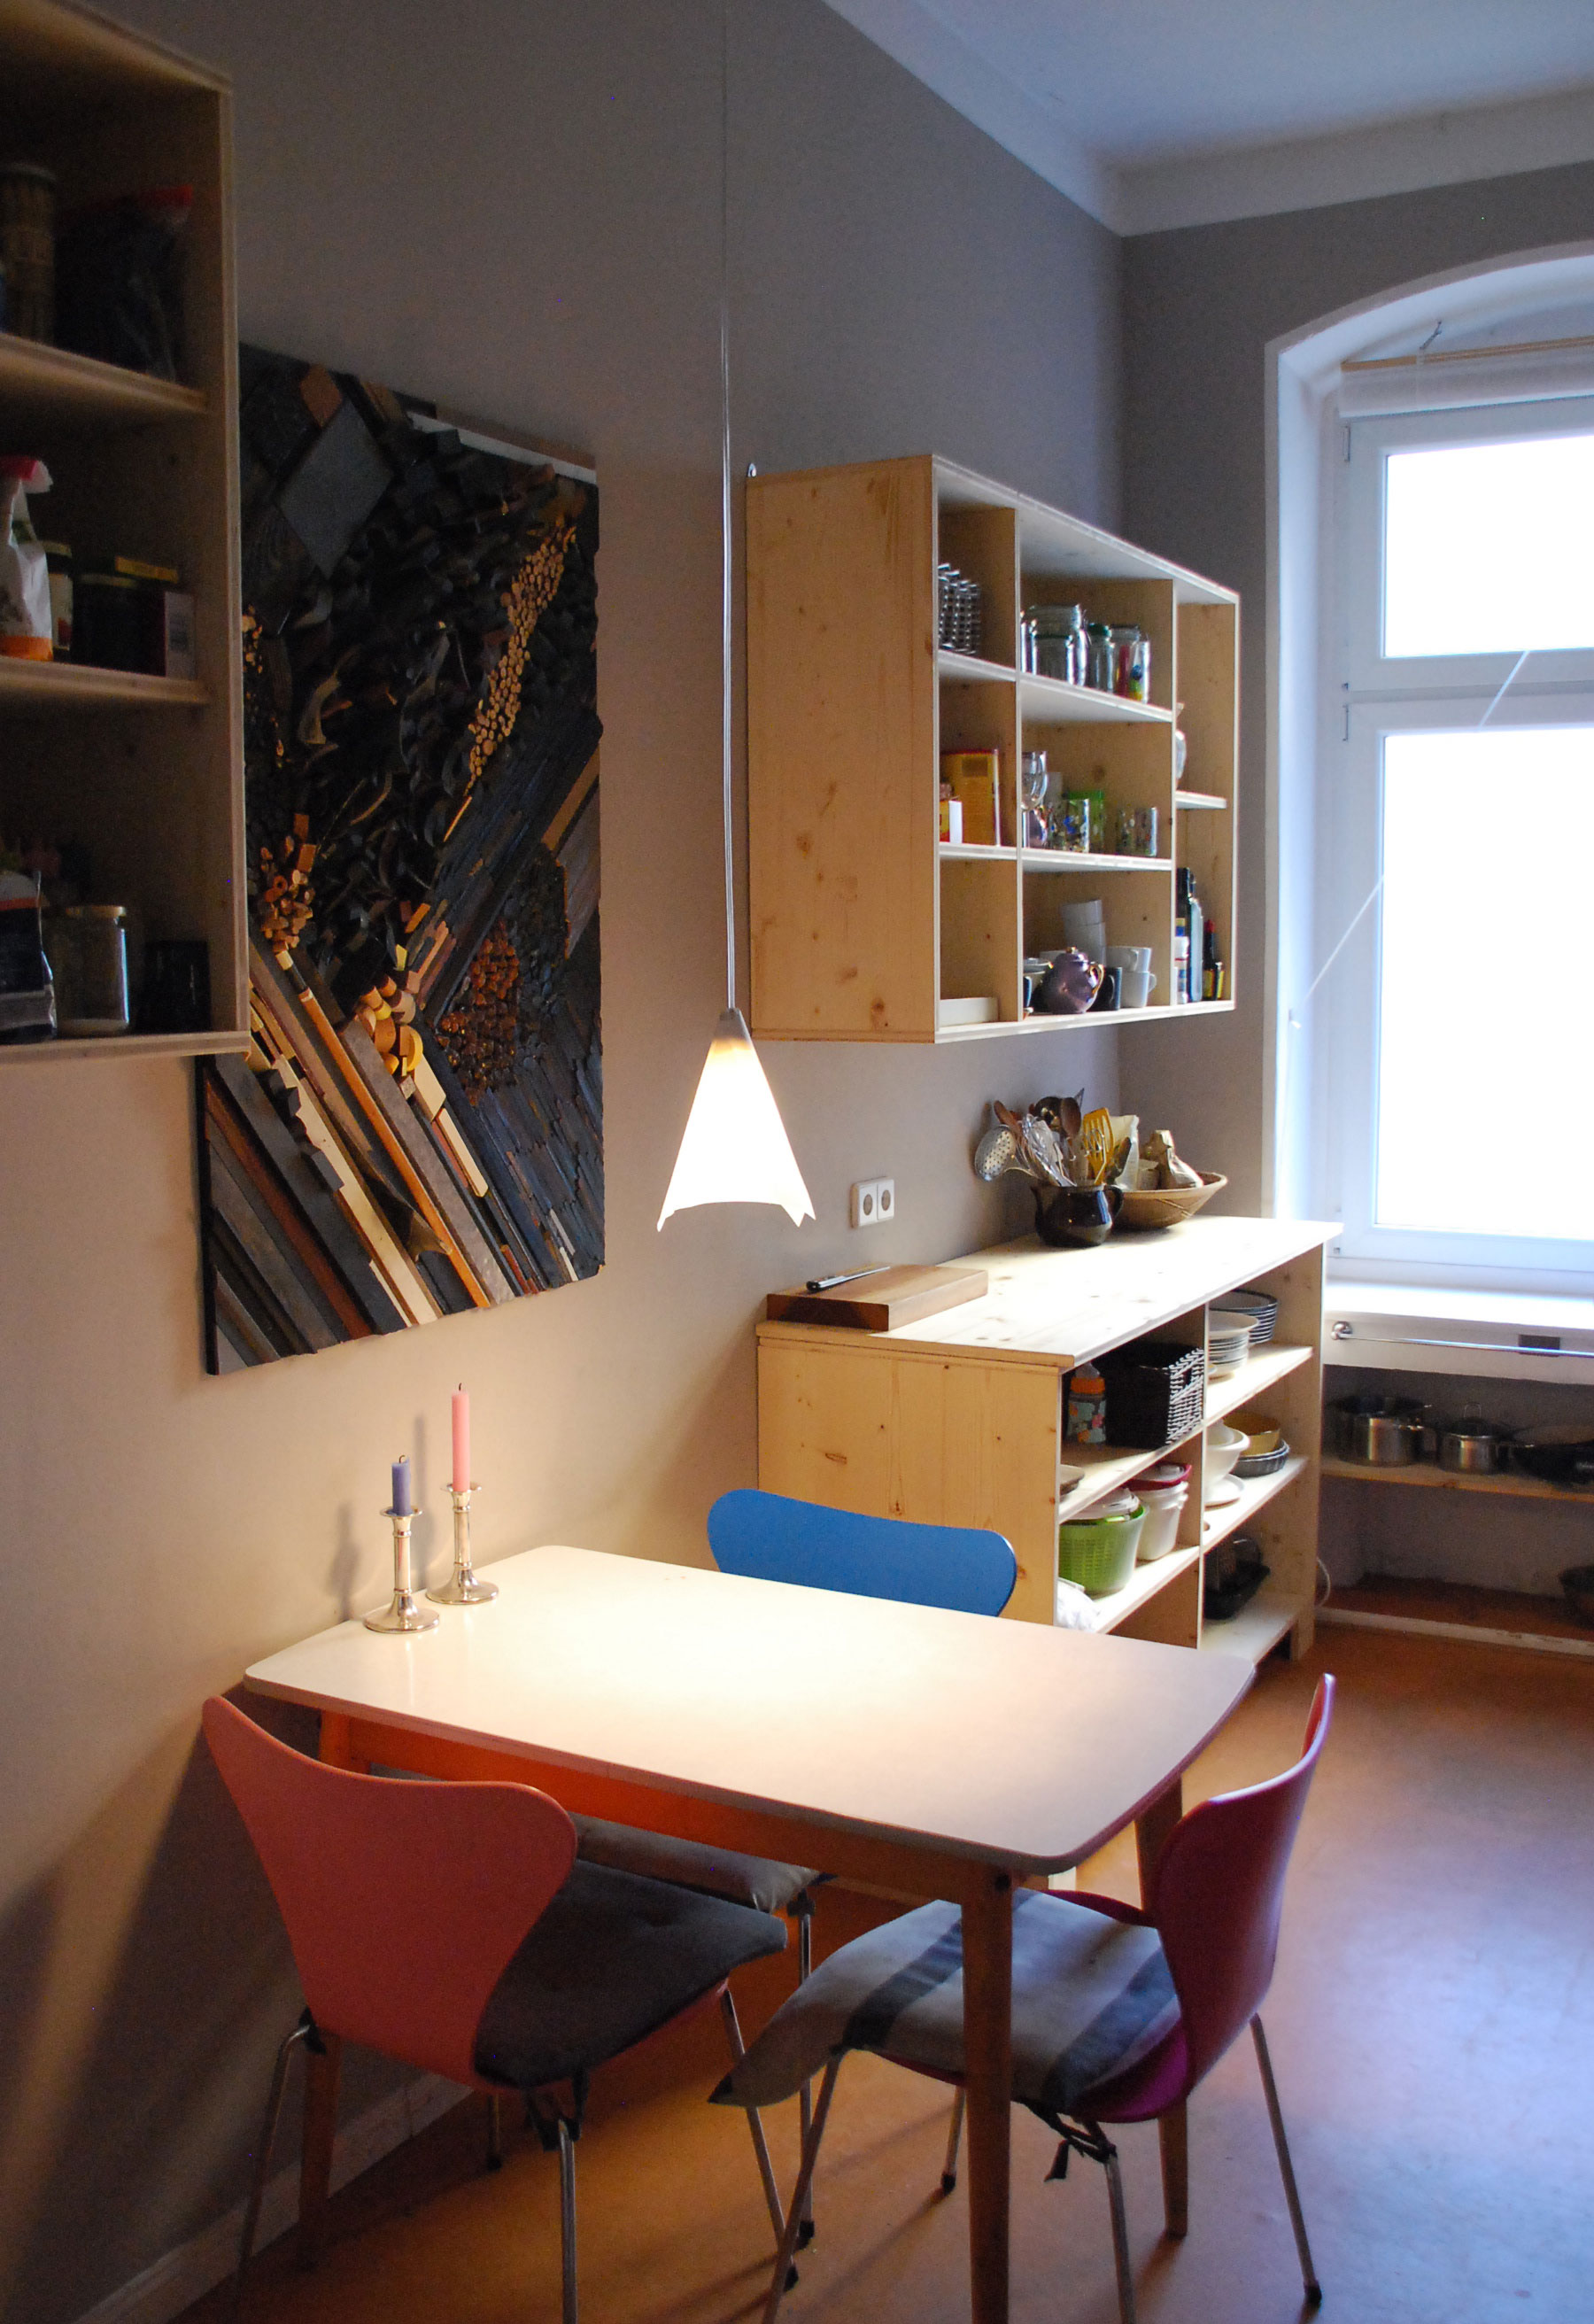 k che eca hans schultze. Black Bedroom Furniture Sets. Home Design Ideas